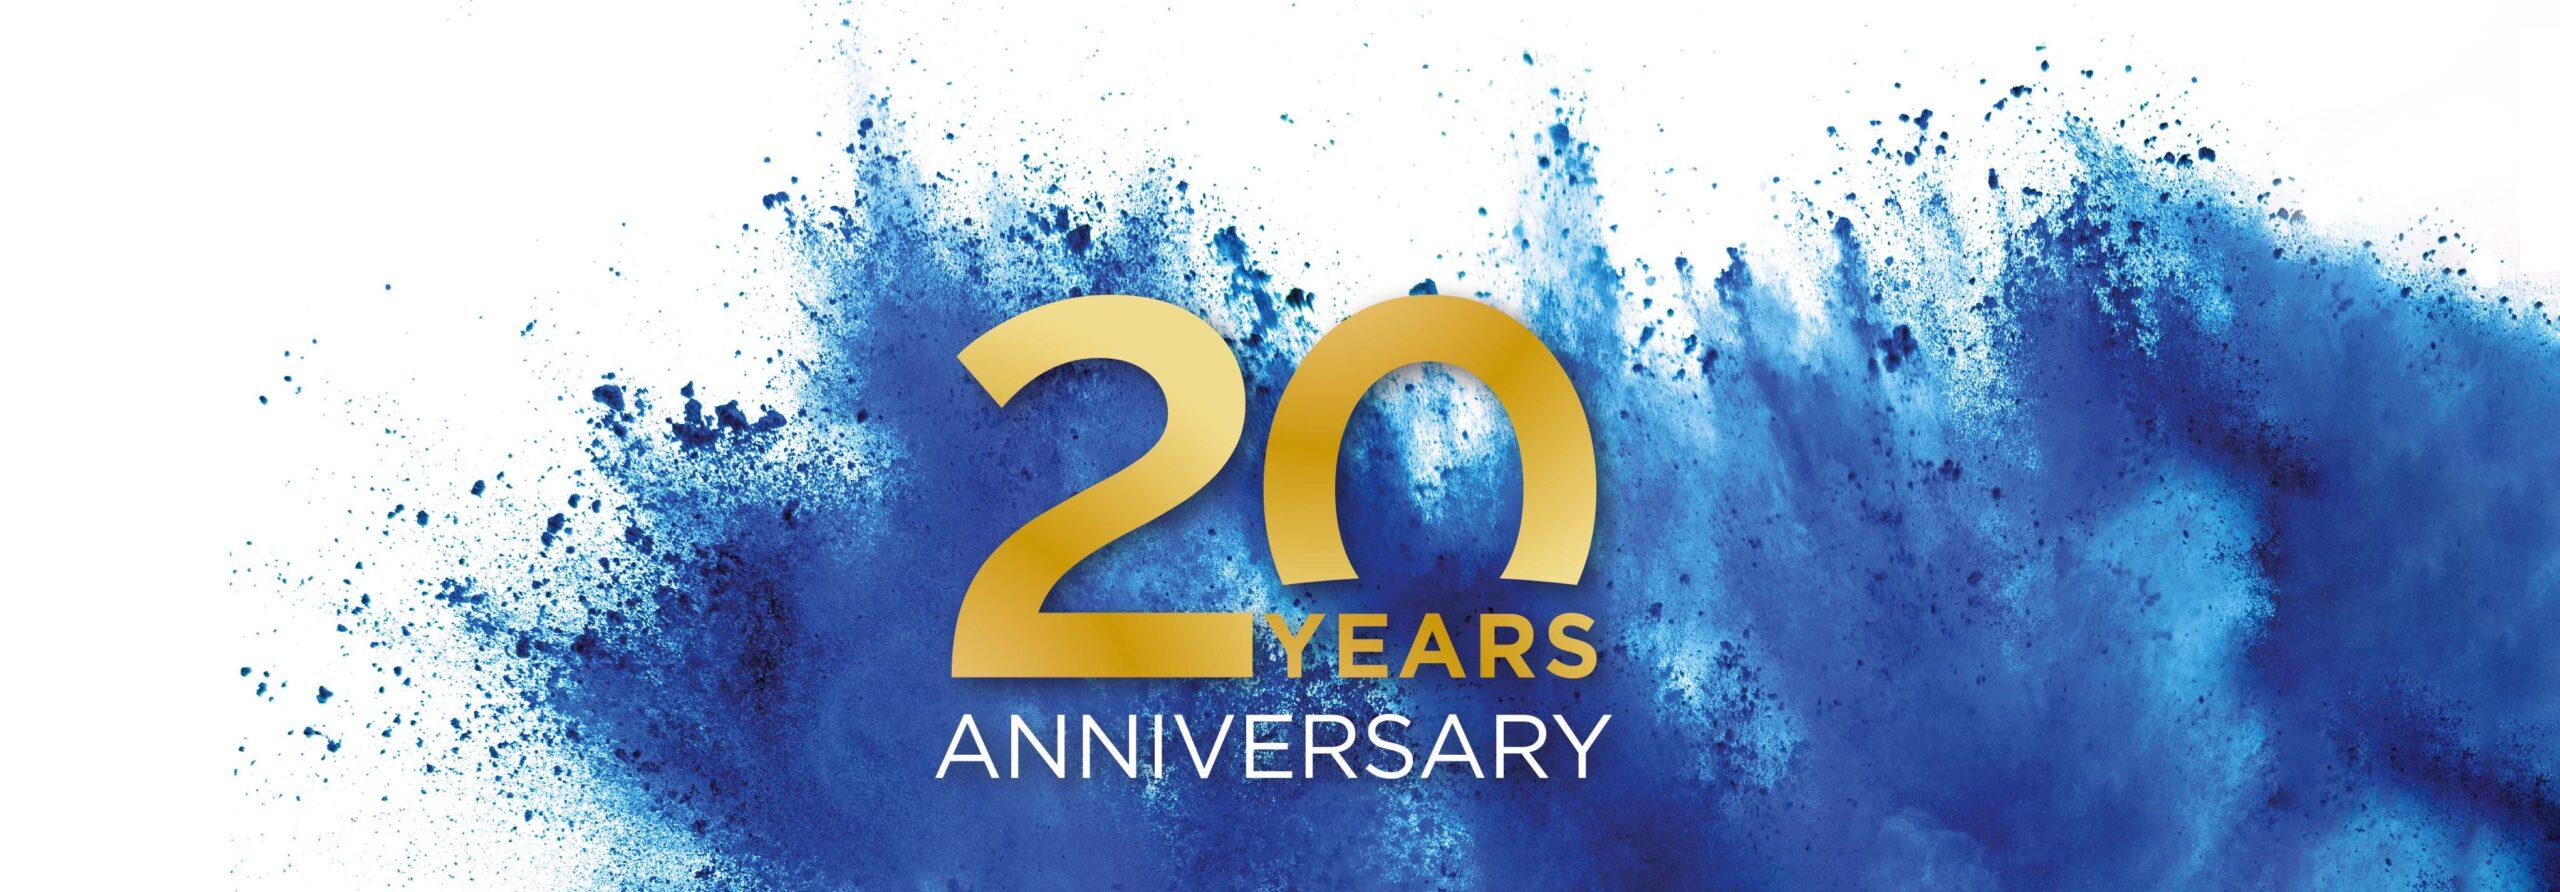 geopharma_20th_anniversary-01